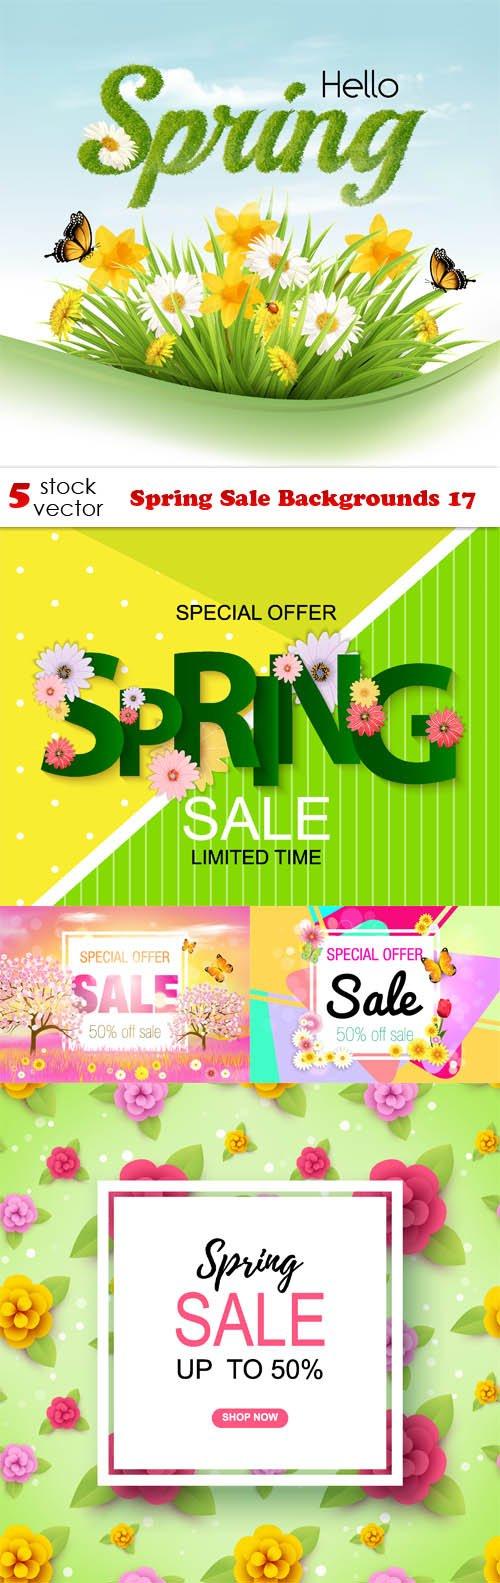 Vectors - Spring Sale Backgrounds 17